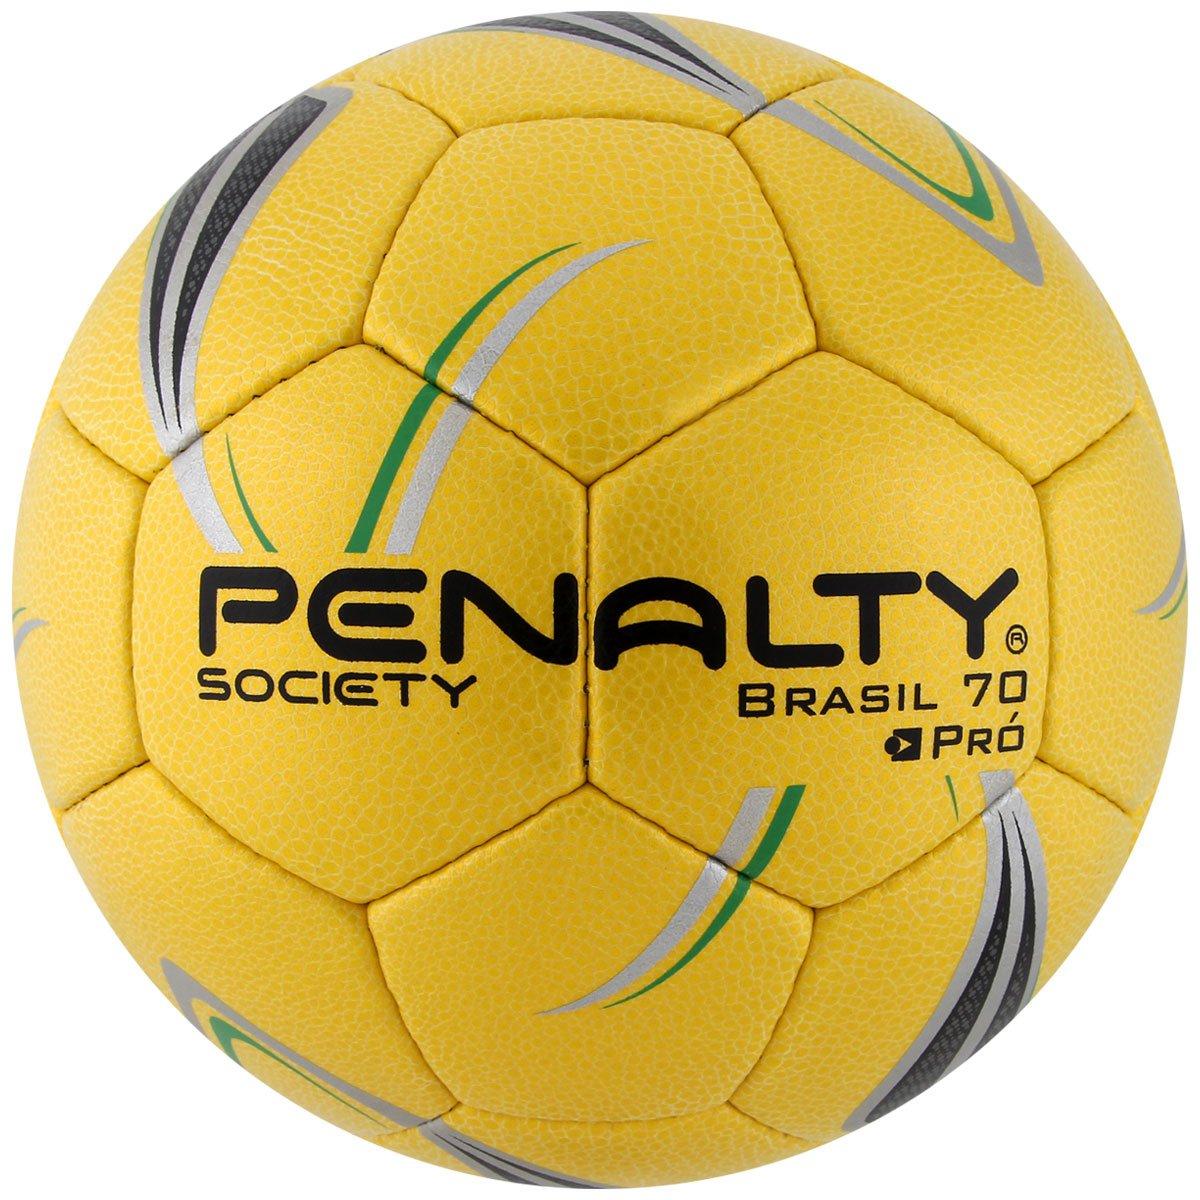 aa54ef8c20 Bola Futebol Penalty Brasil 70 Society - Compre Agora